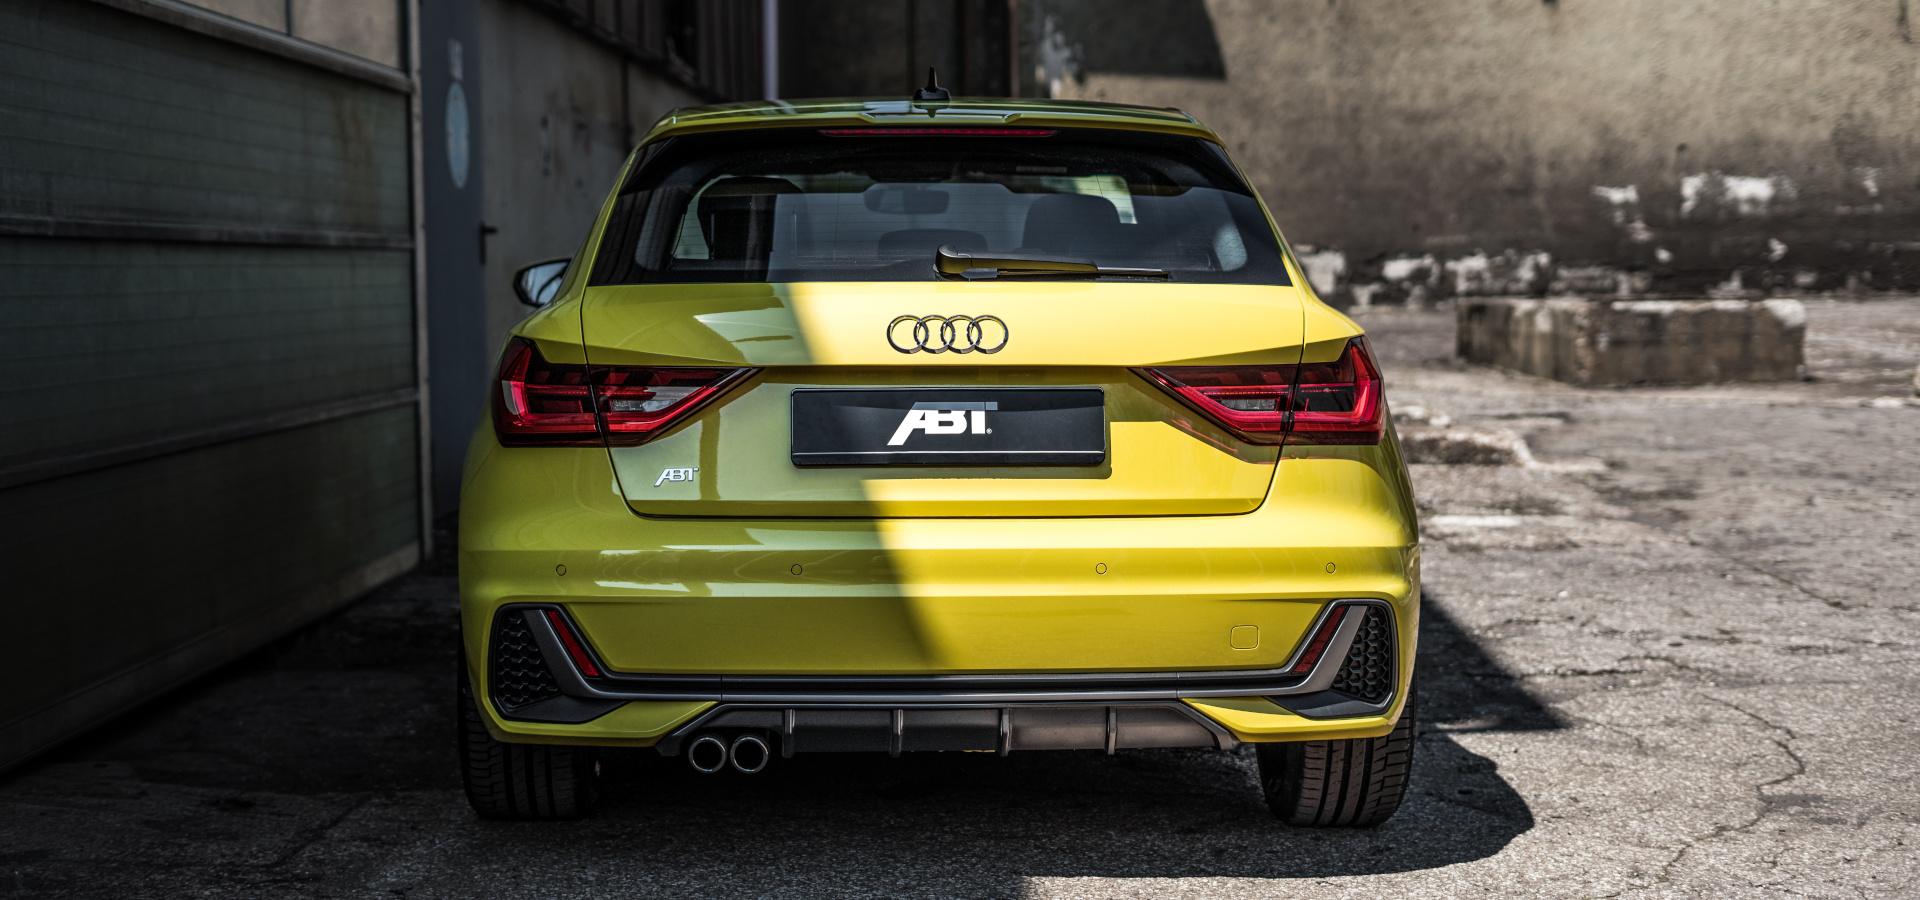 Audi A1 Abt Sportsline